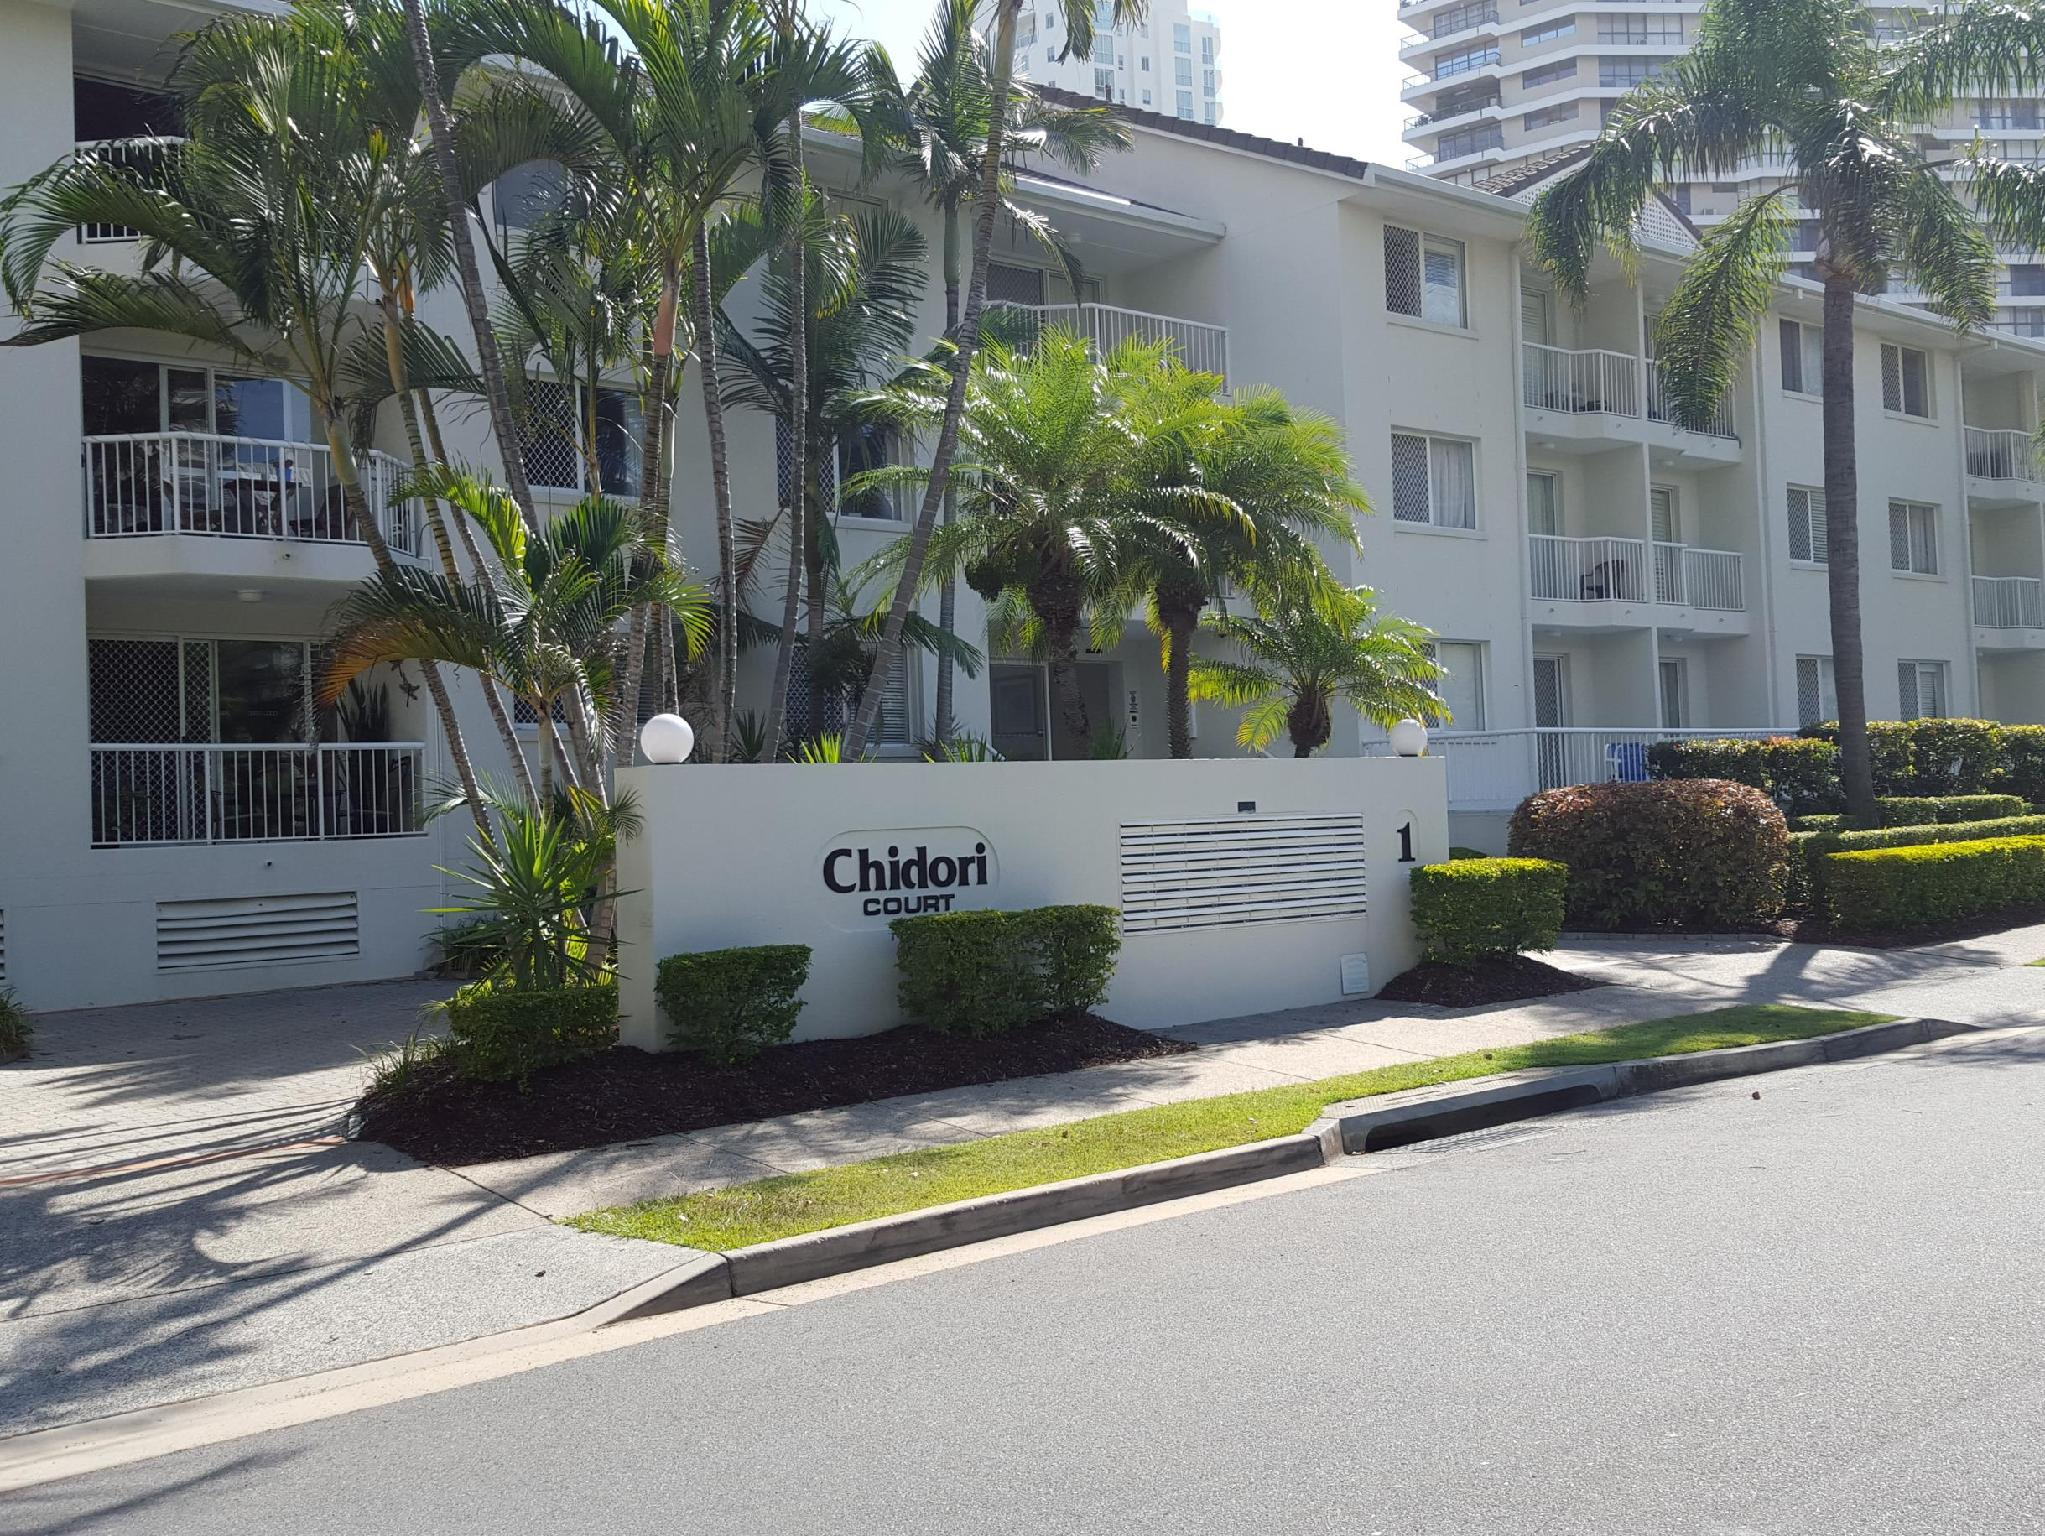 Chidori Court Hotel - Hotell och Boende i Australien , Guldkusten